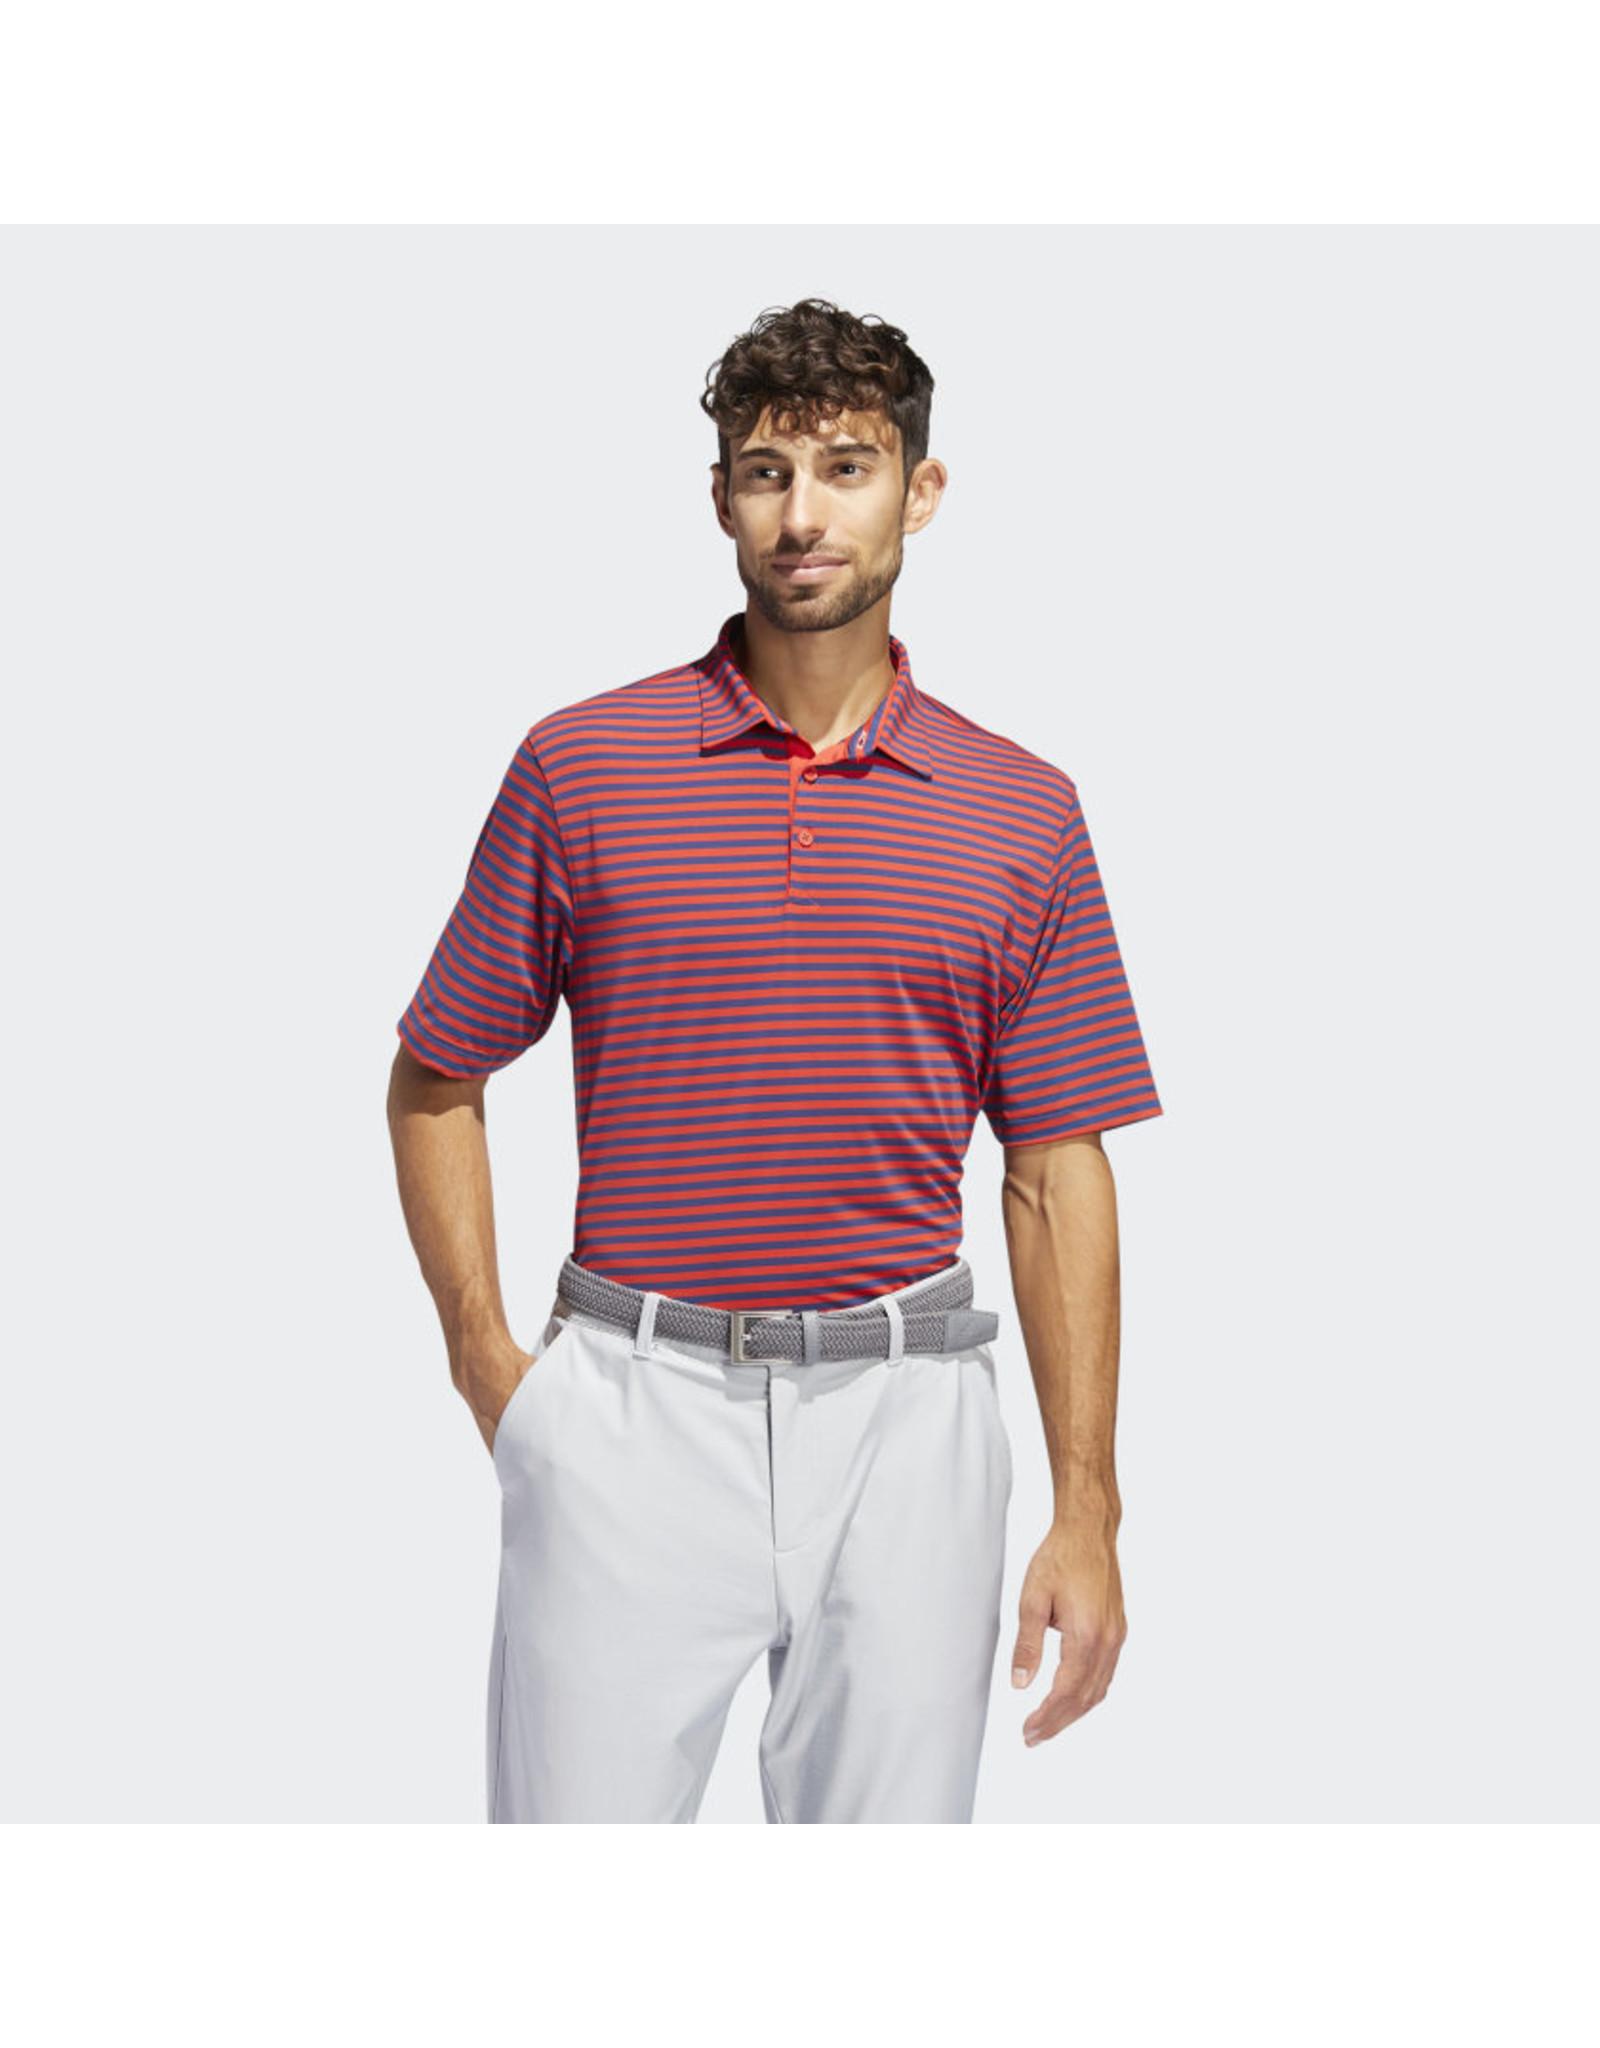 Adidas Shirt Adipure STRP